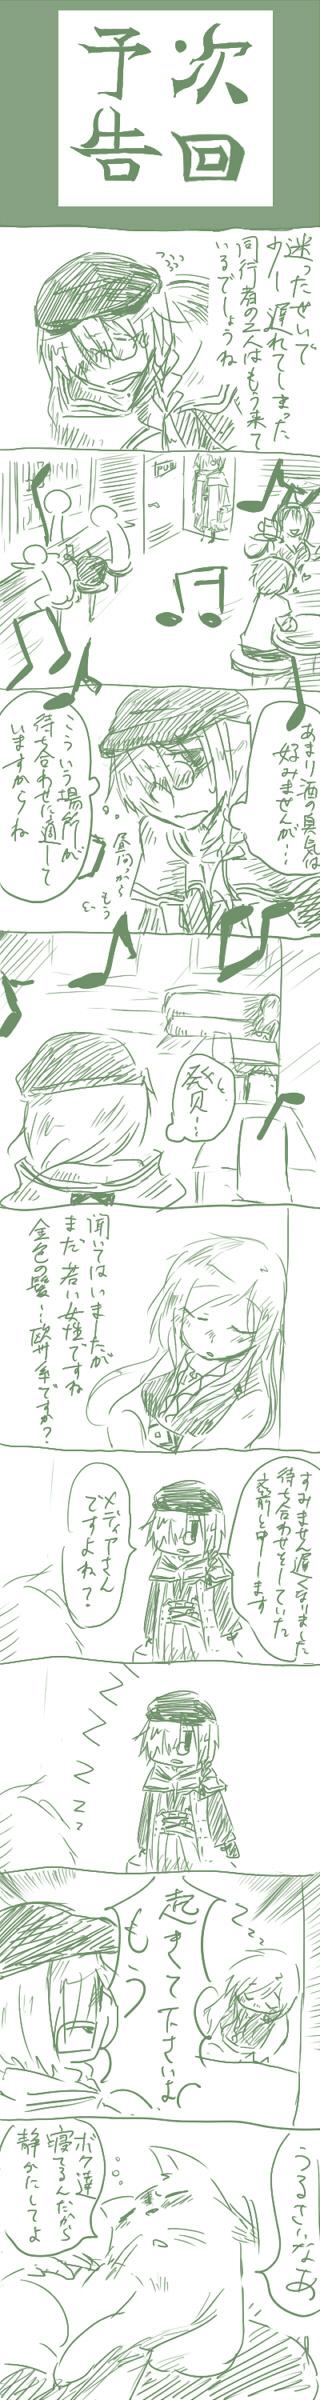 rokumei-manga02.jpg